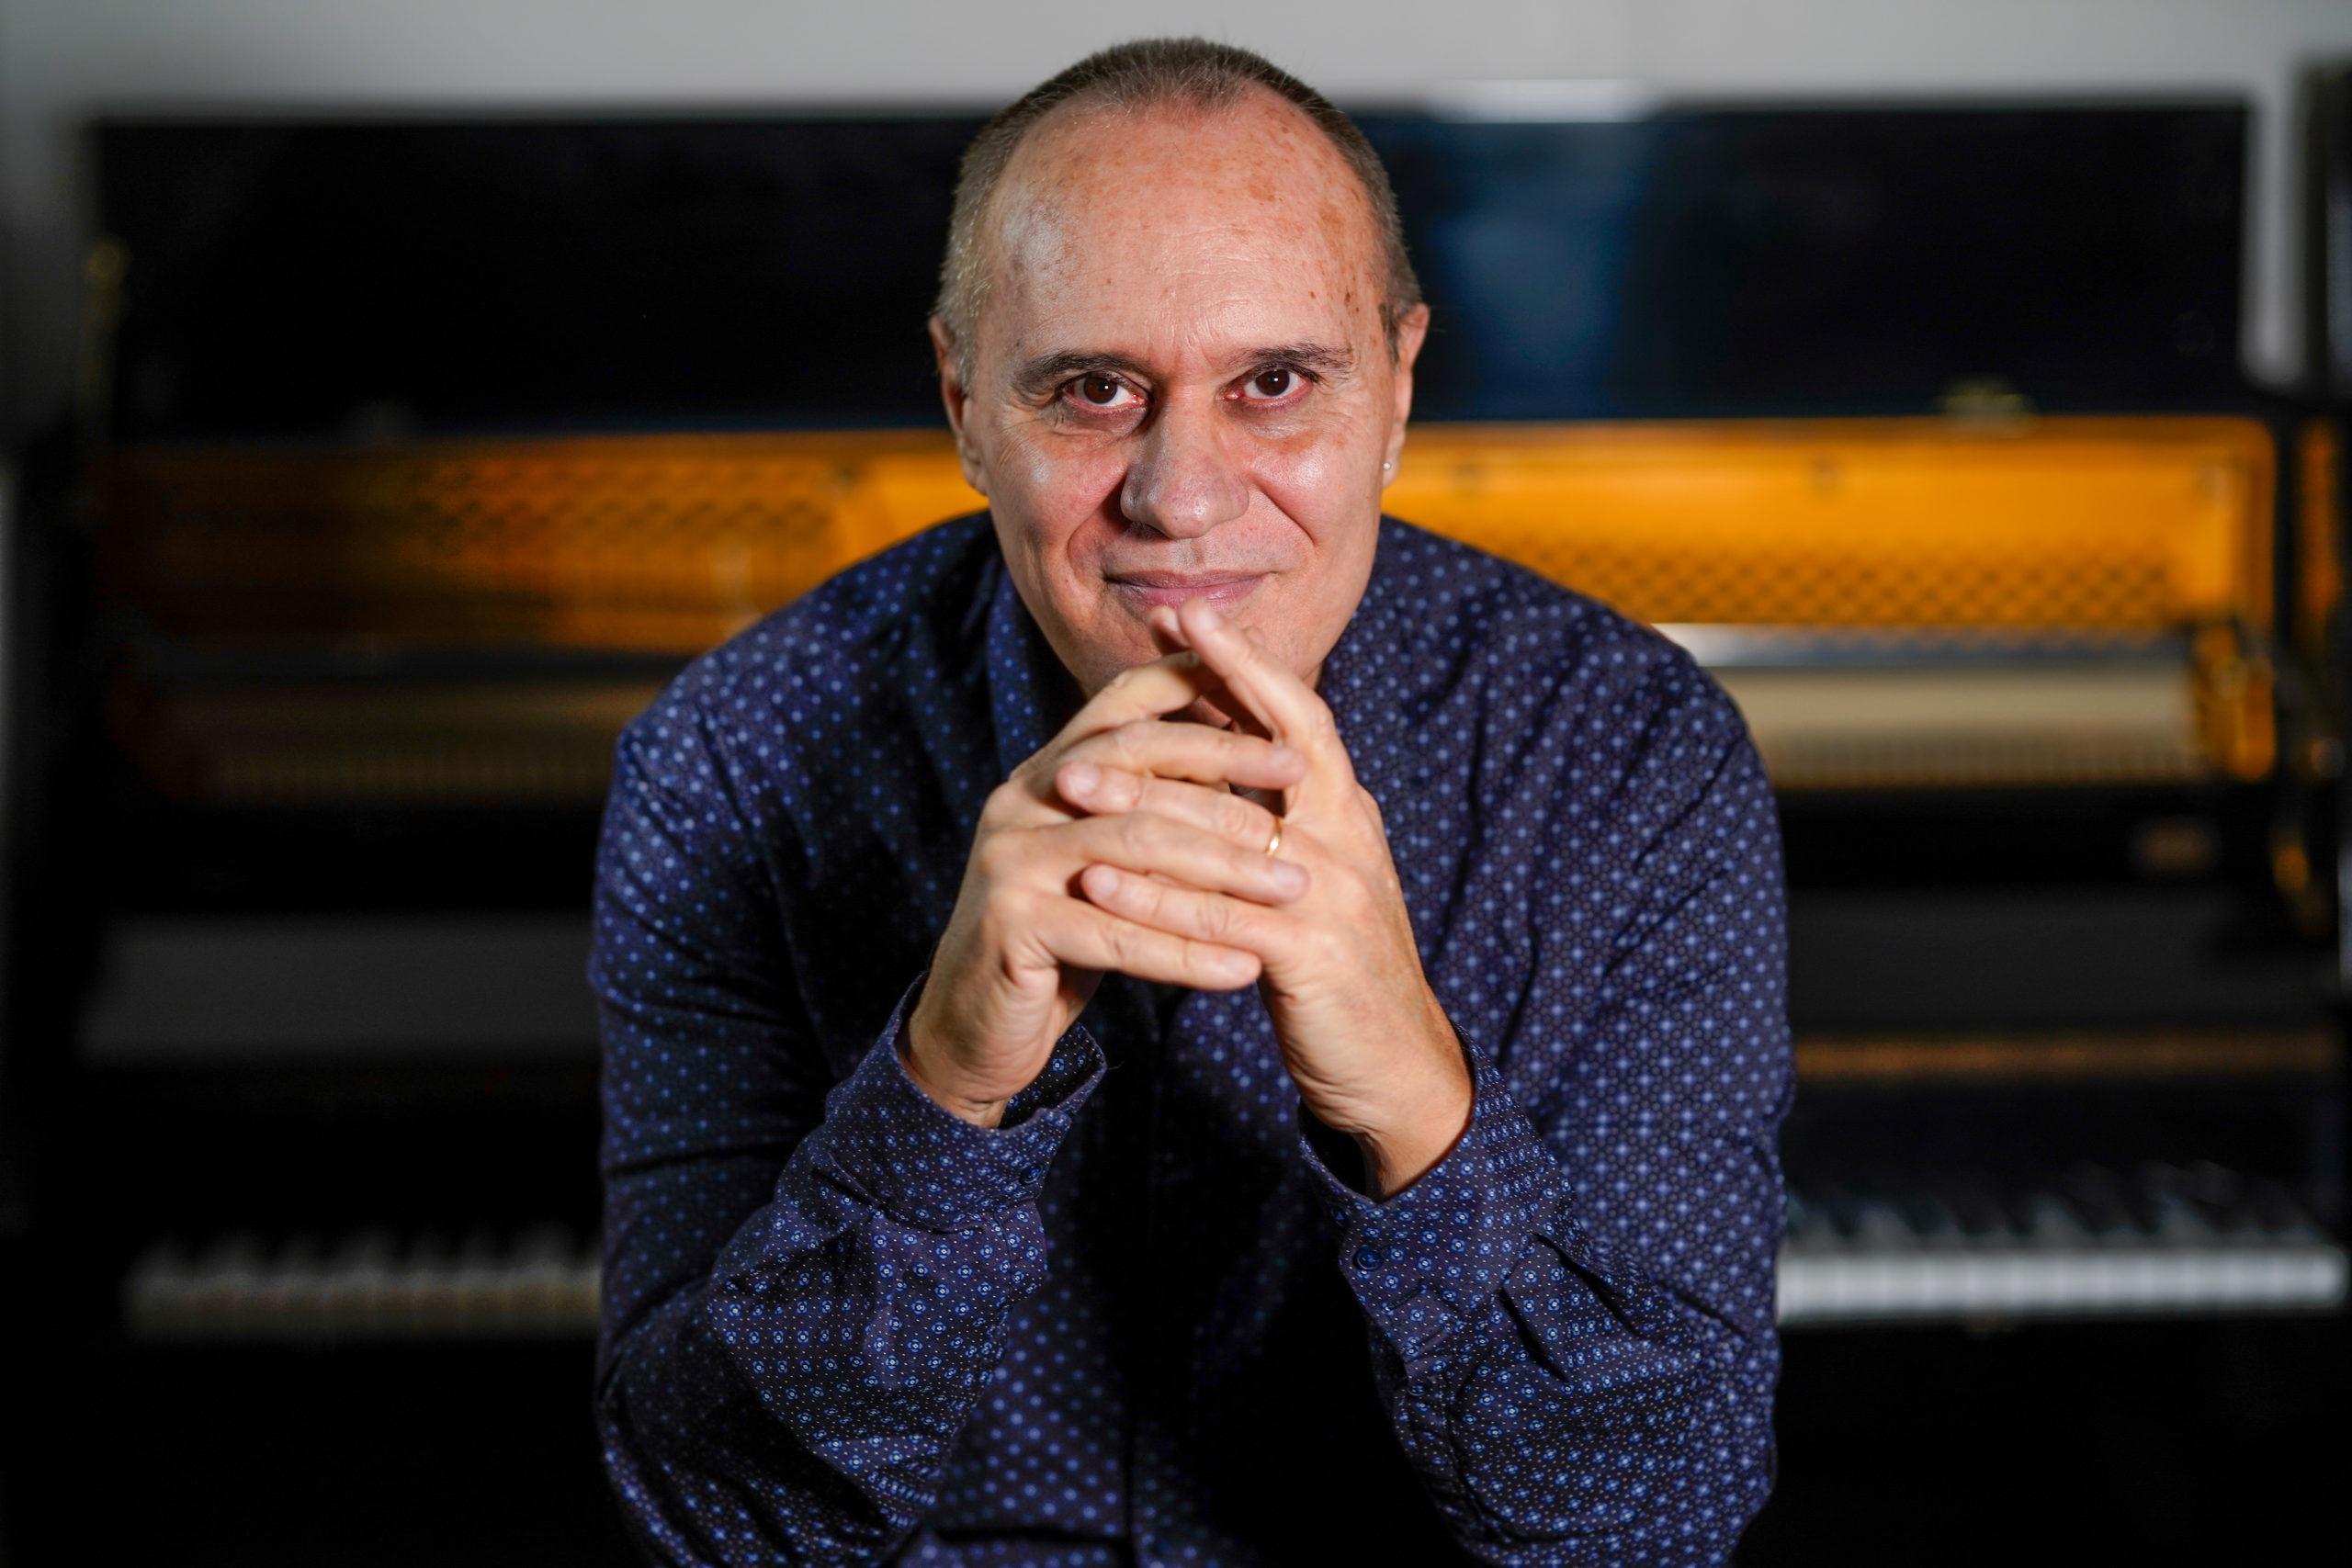 Giancarlo Di Maria Ph. Riccardo Sarti